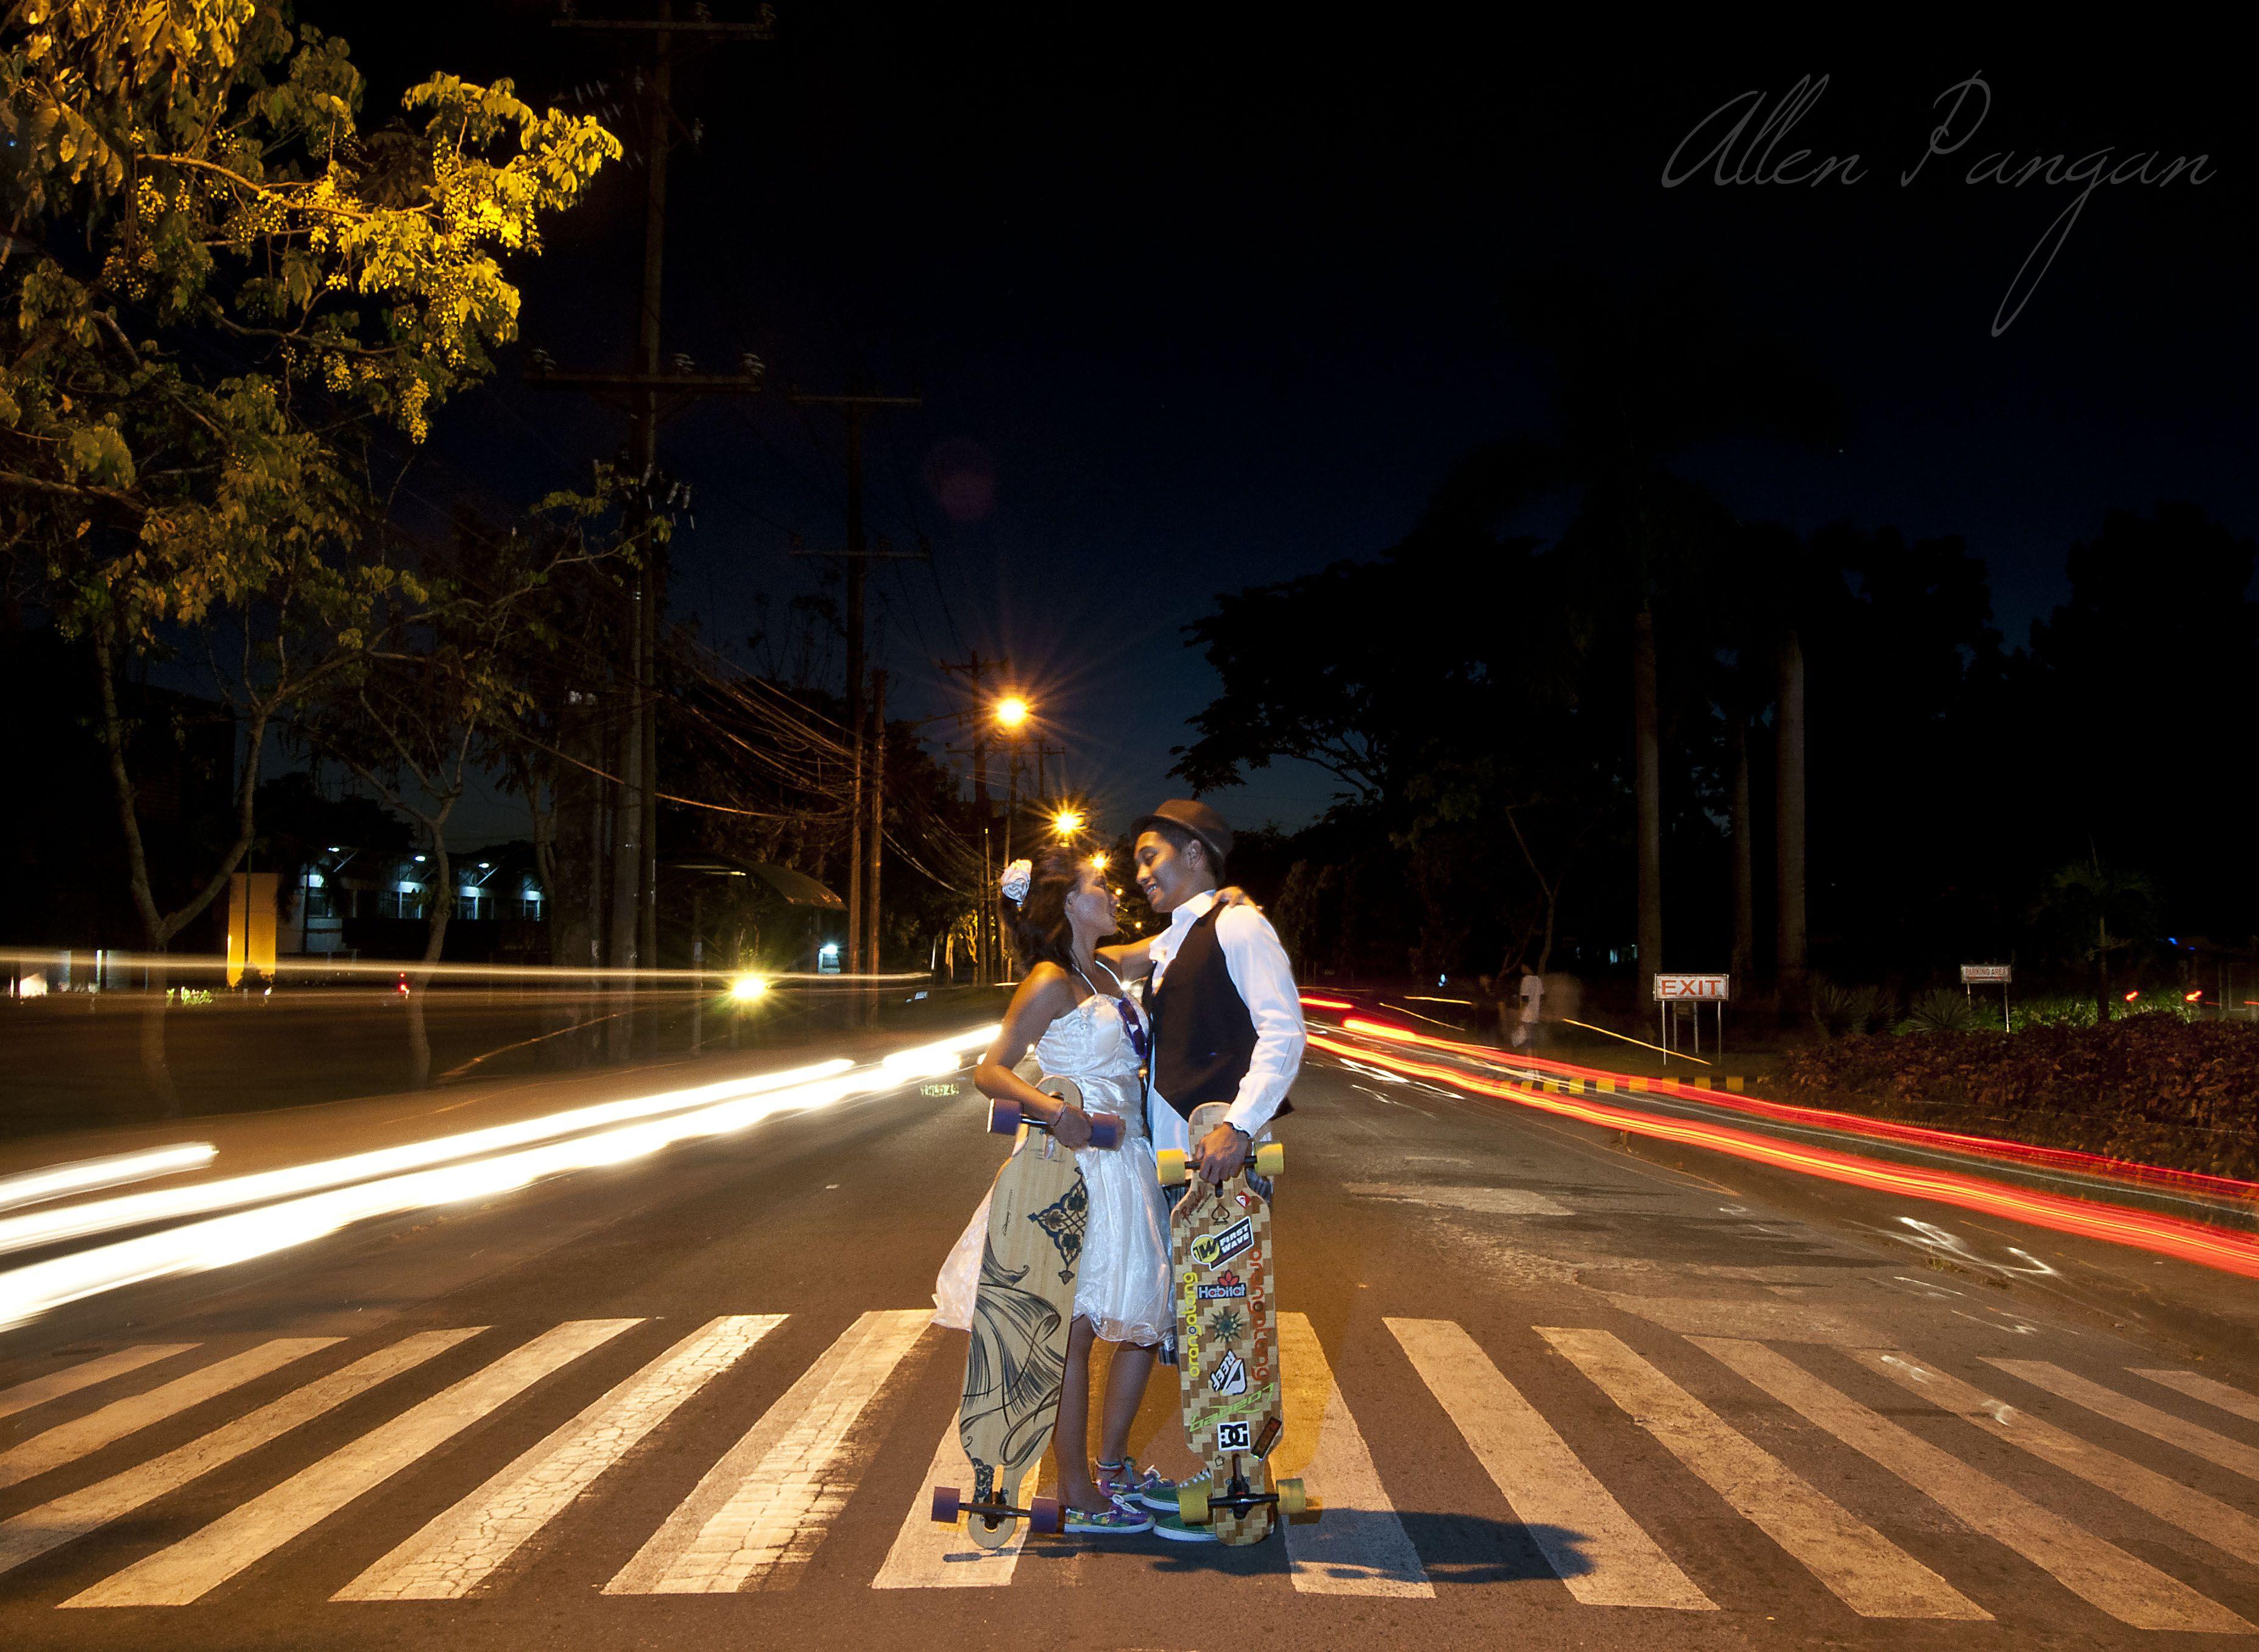 Official SKATE PreNup Photos of LA + Eesai by ©Allen Pangan ♥